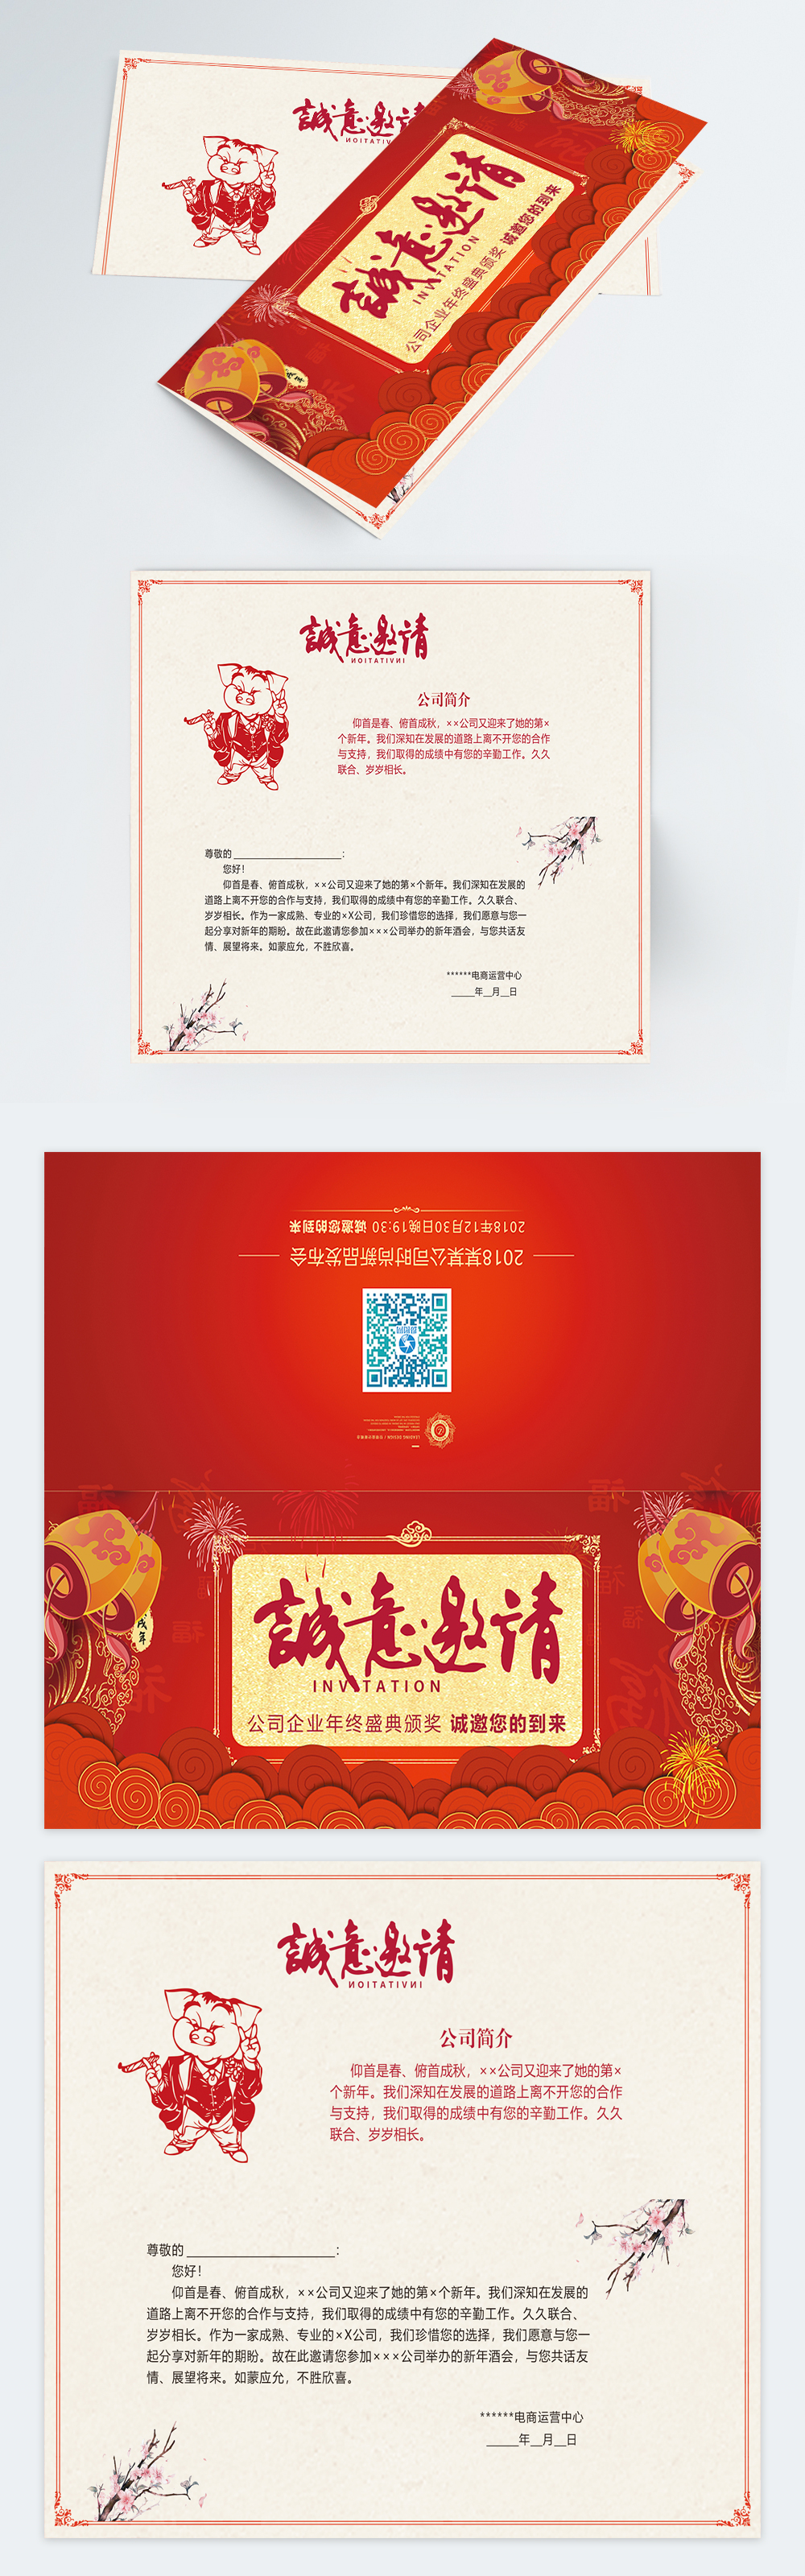 invitation letter for new year celebration award presentation poster